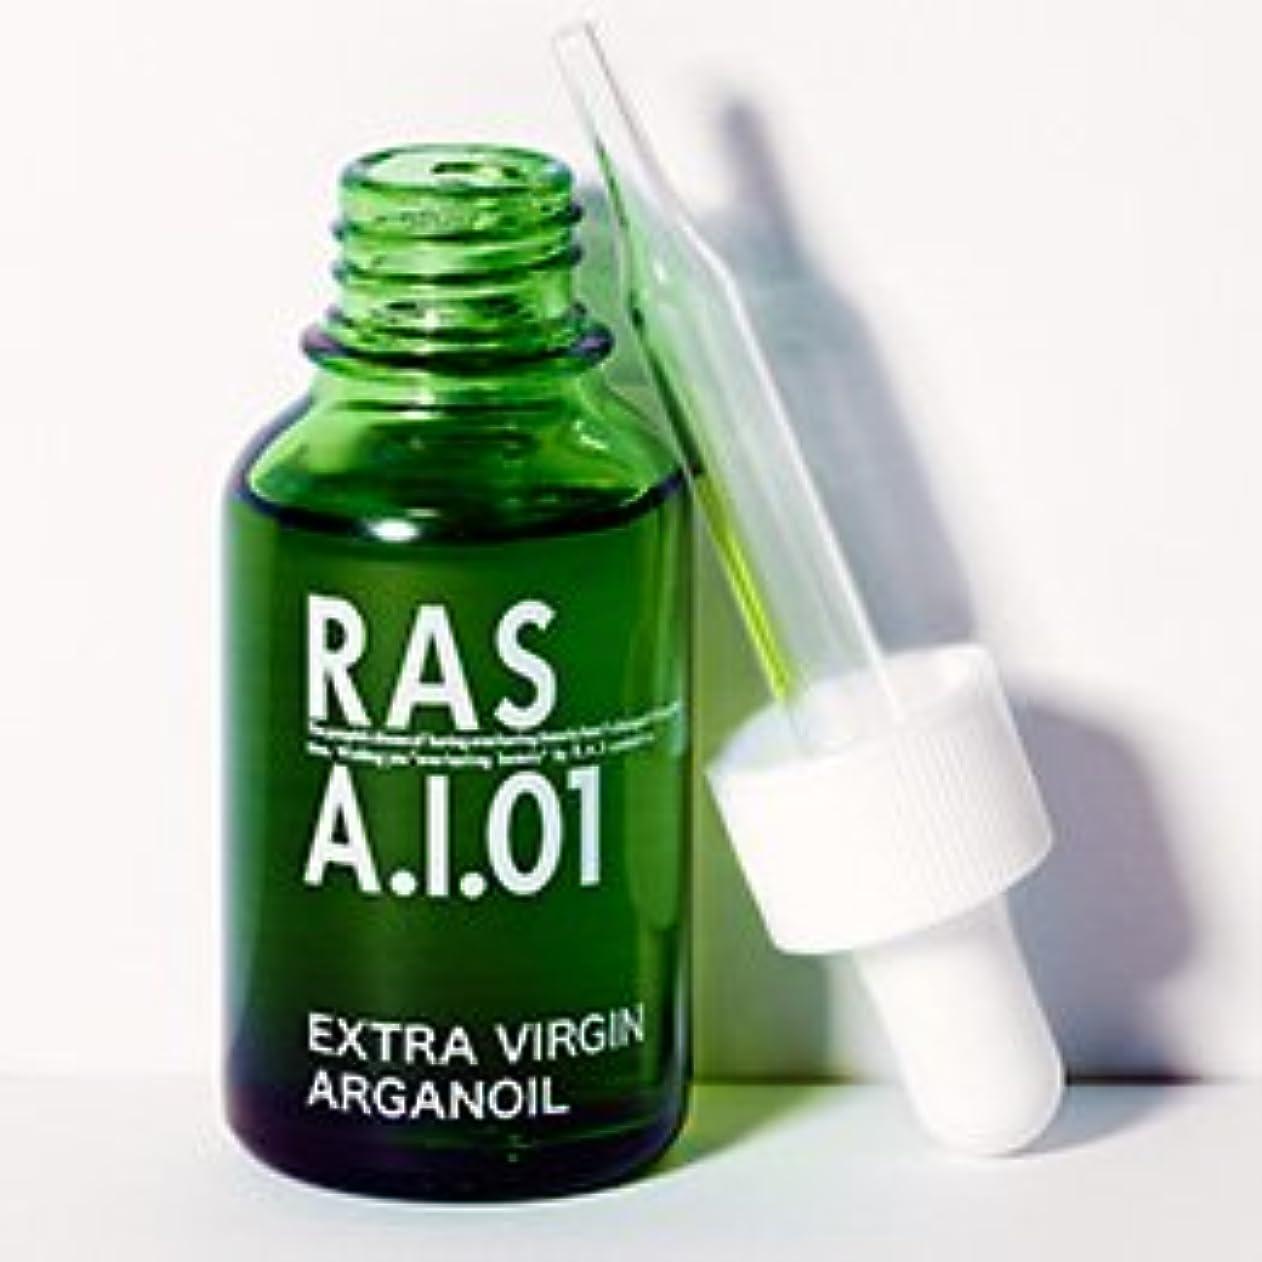 RAS A.I.01 アルガンオイル 30ml 超高圧熟成